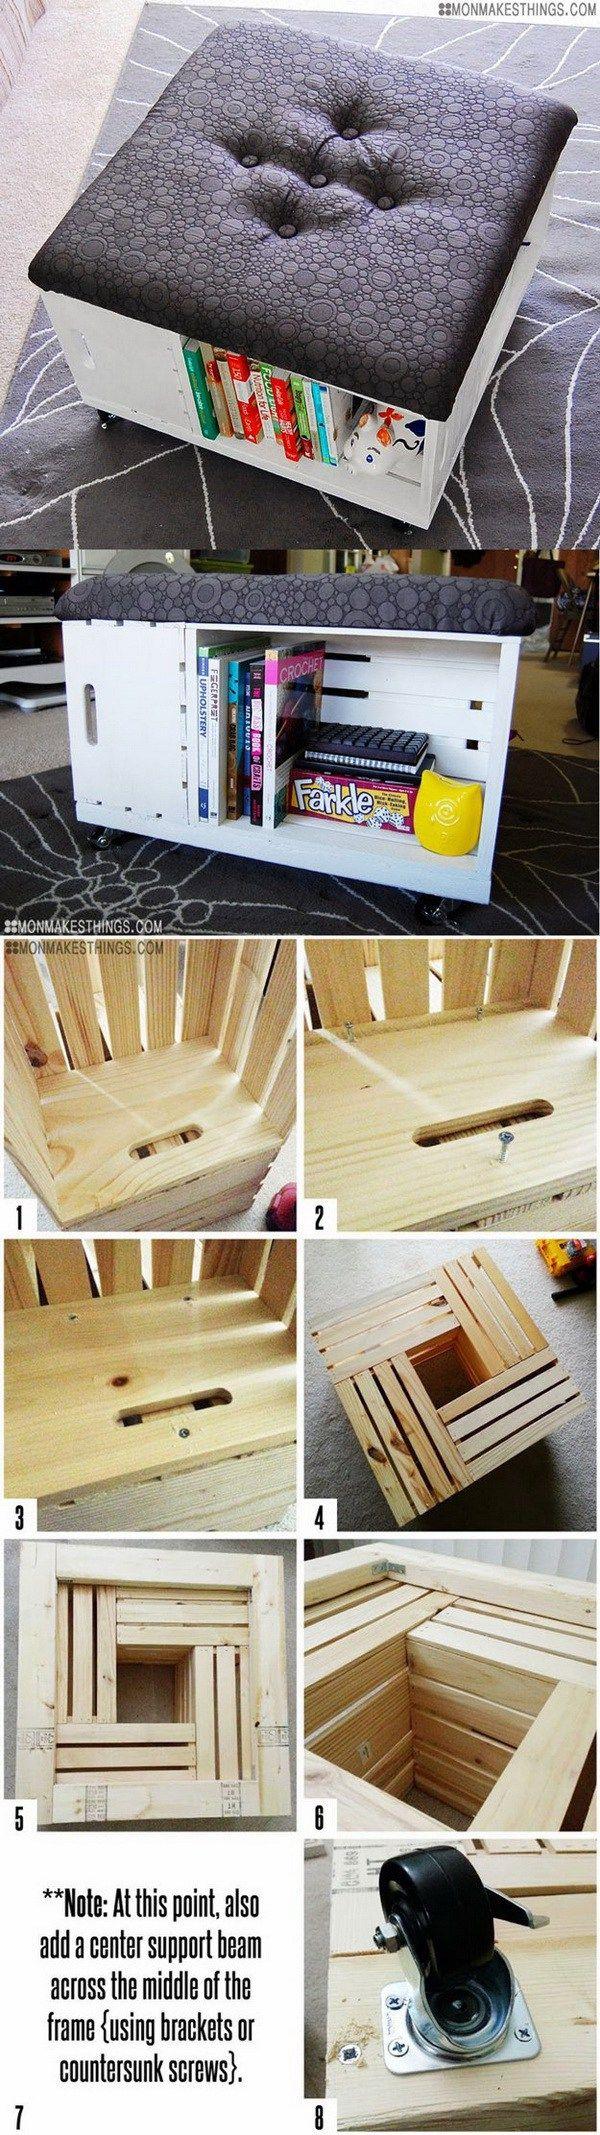 DIY Ideas Of Reusing Old Furniture 14